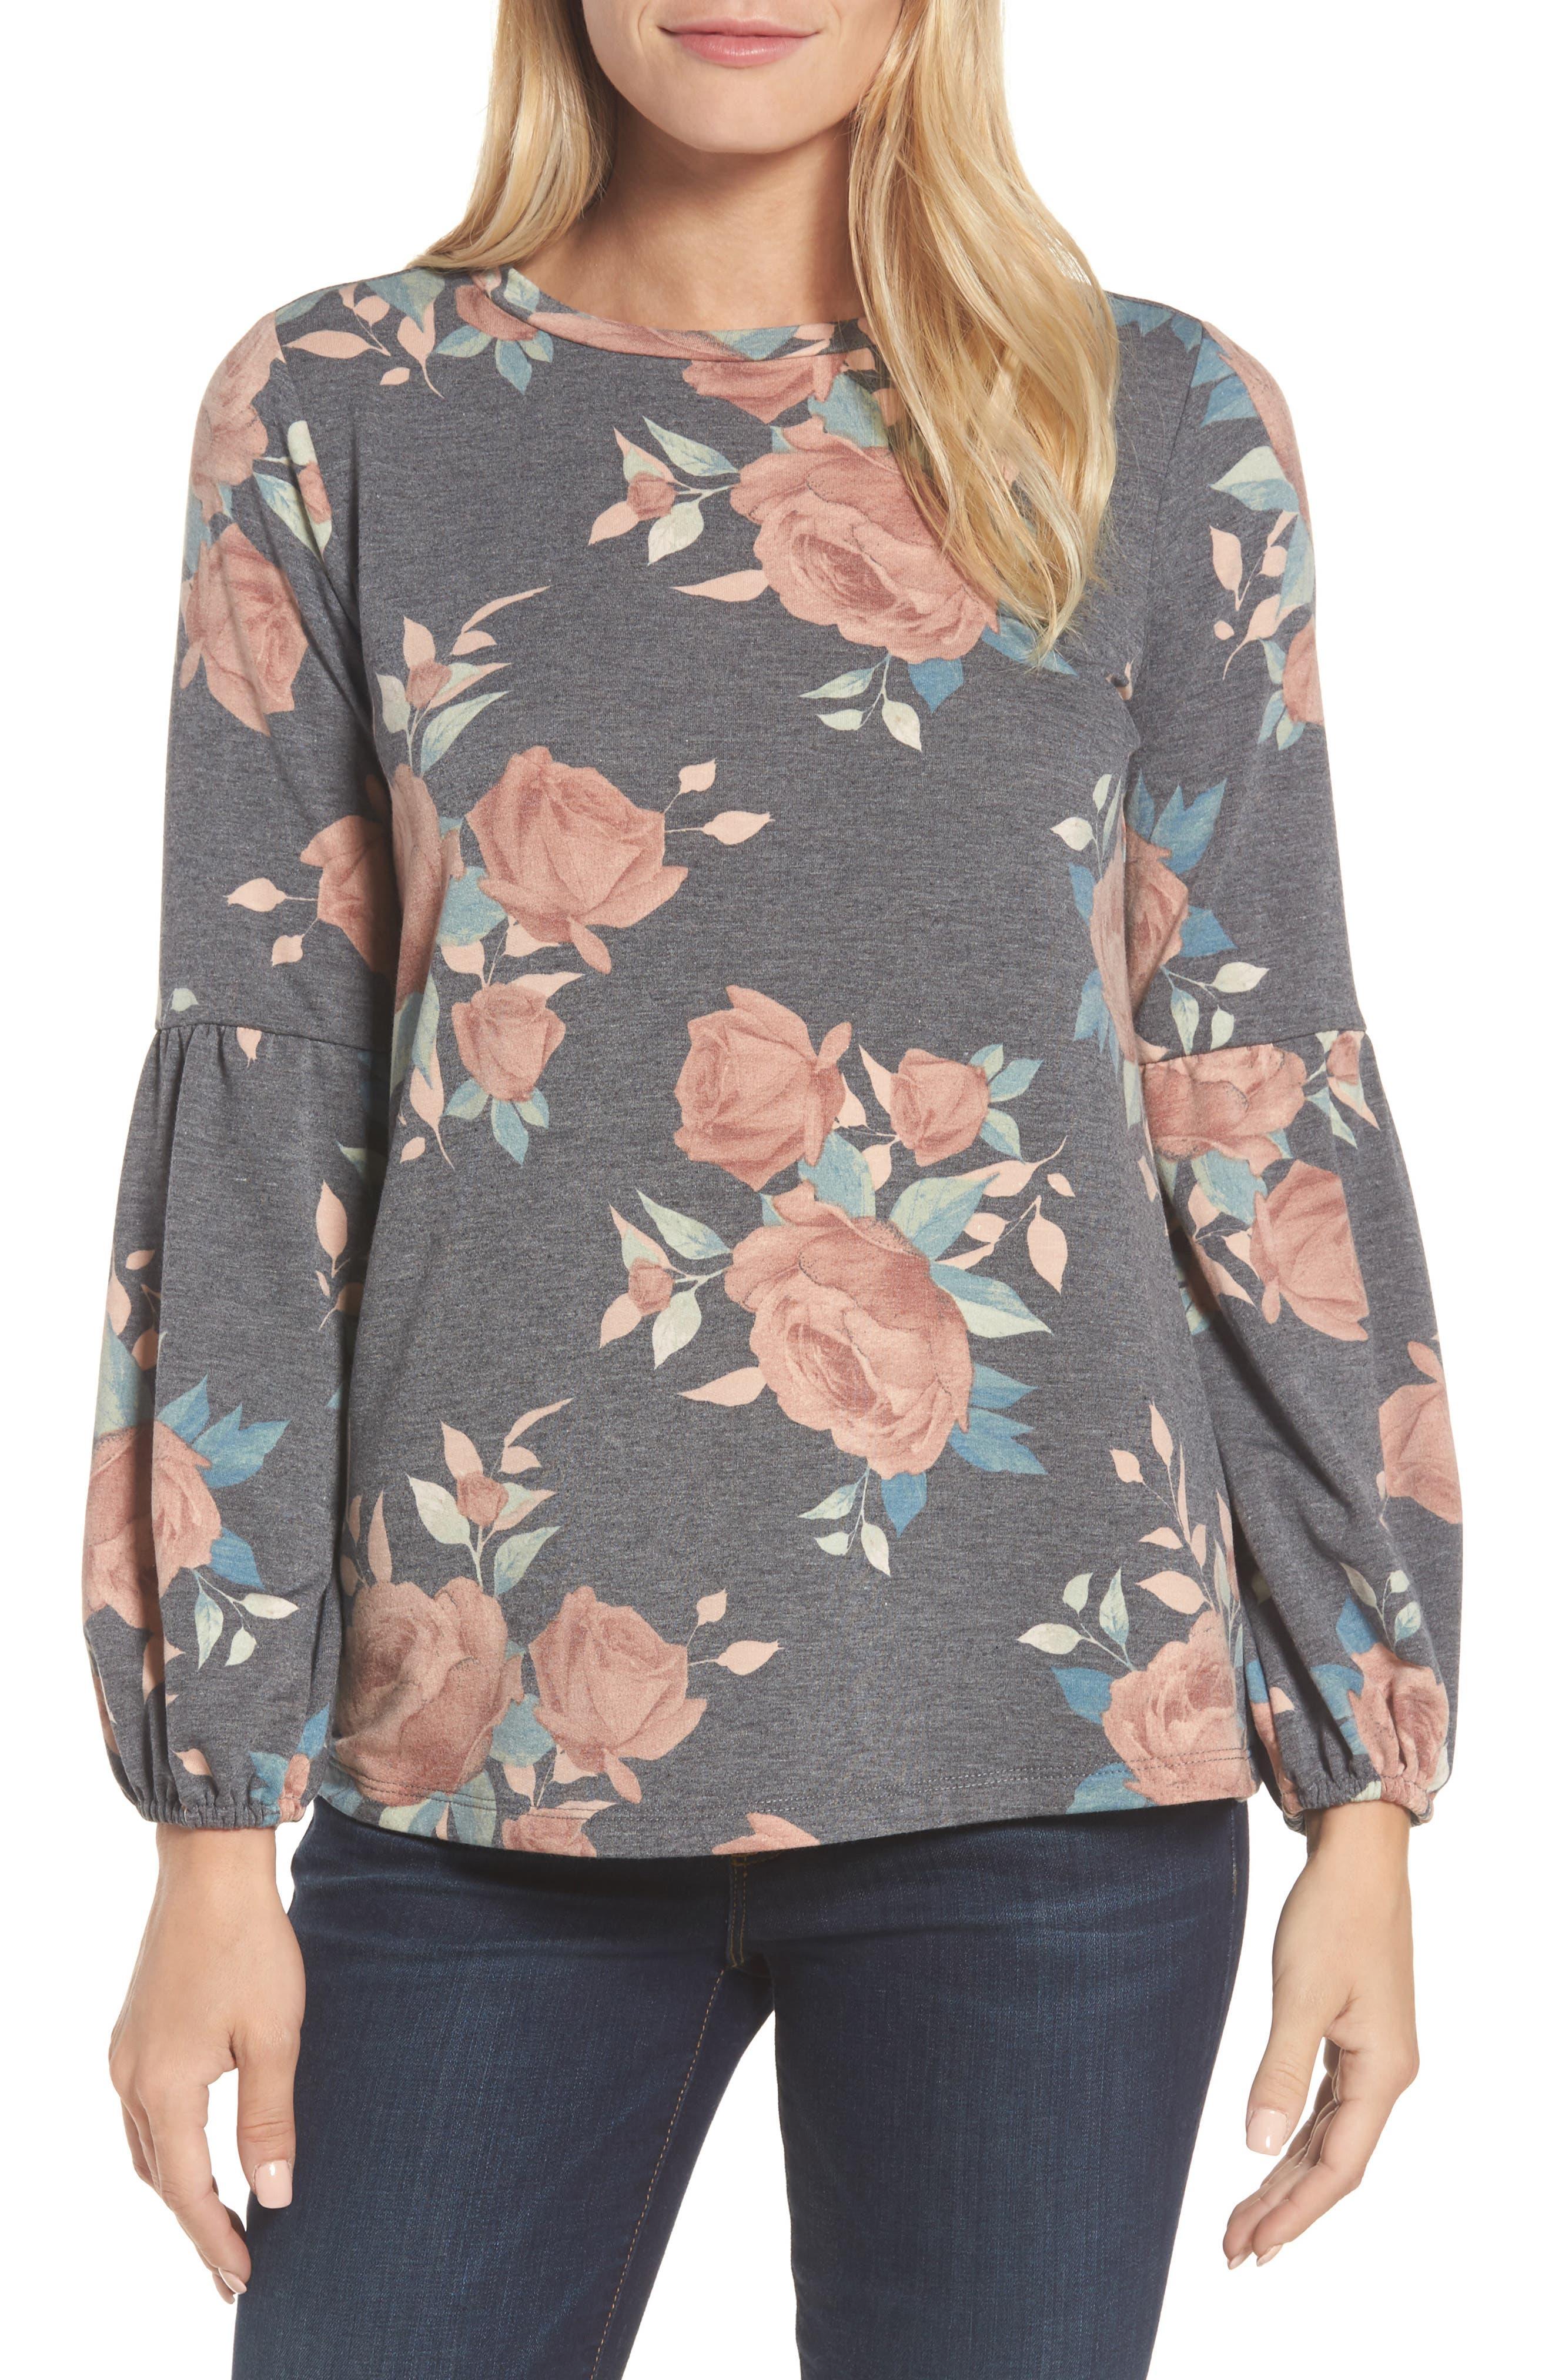 Floral Print Balloon Sleeve Sweatshirt,                             Main thumbnail 1, color,                             Black/ Blush